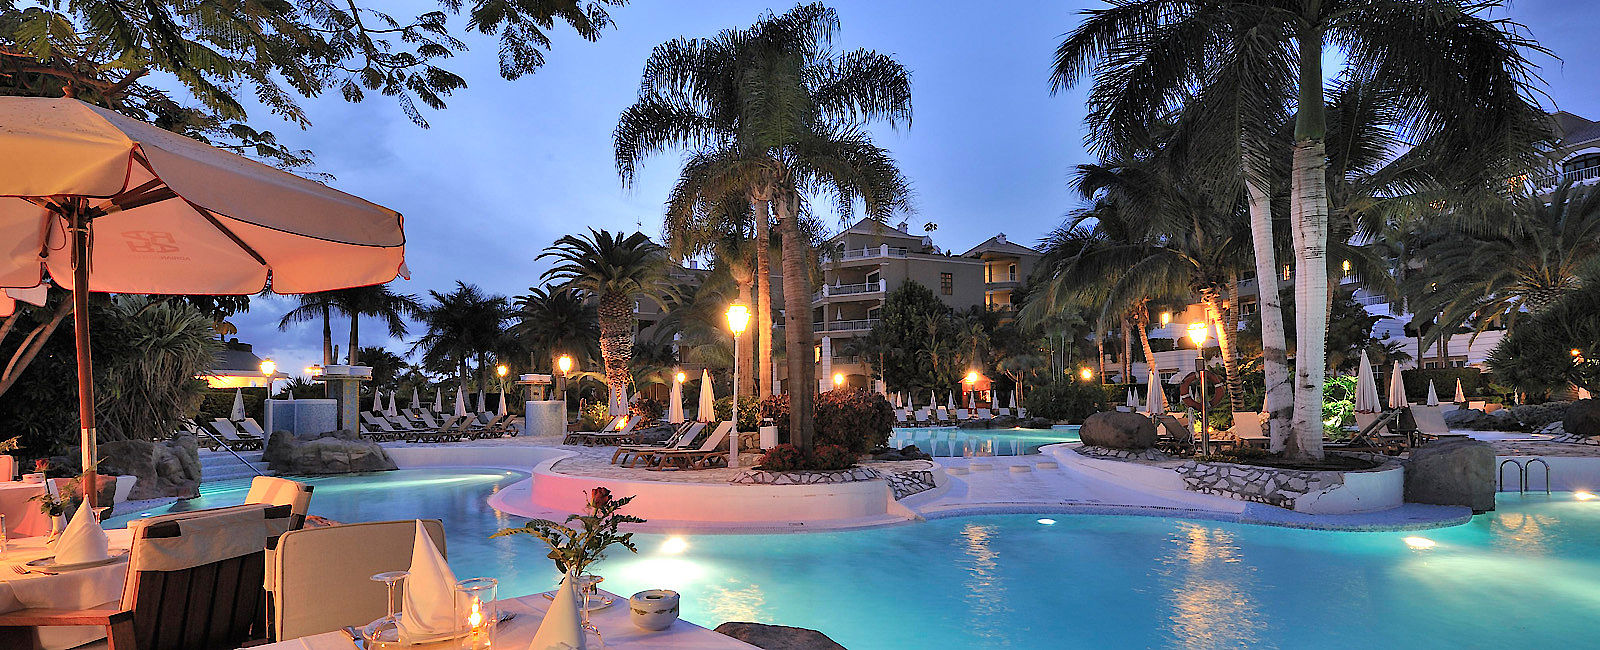 Hotel Jardines De Nivaria Connoisseur Circle Hoteltest